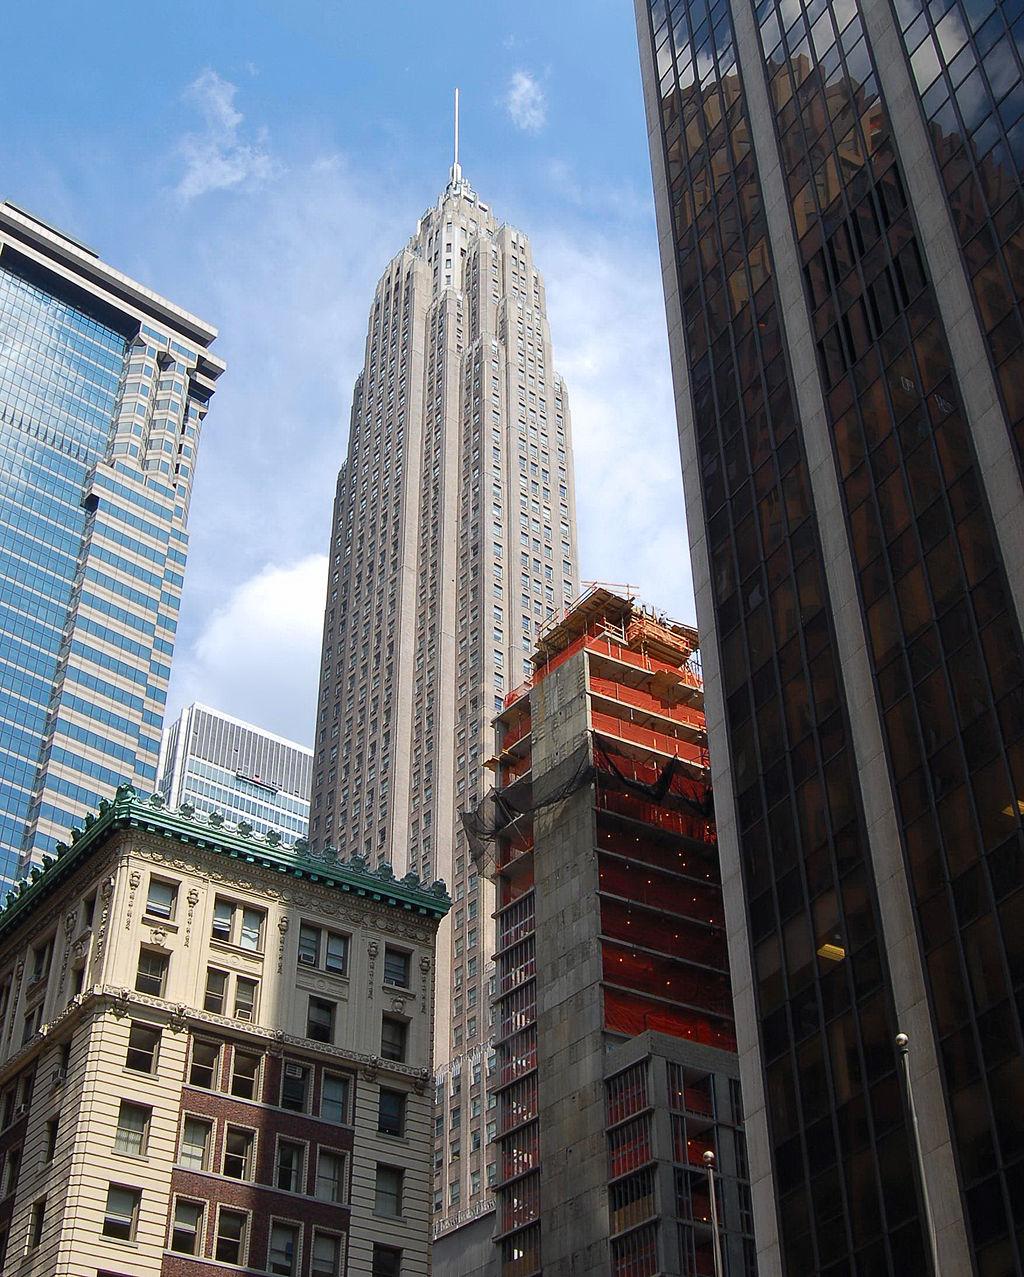 美国国际大厦(American International Building)